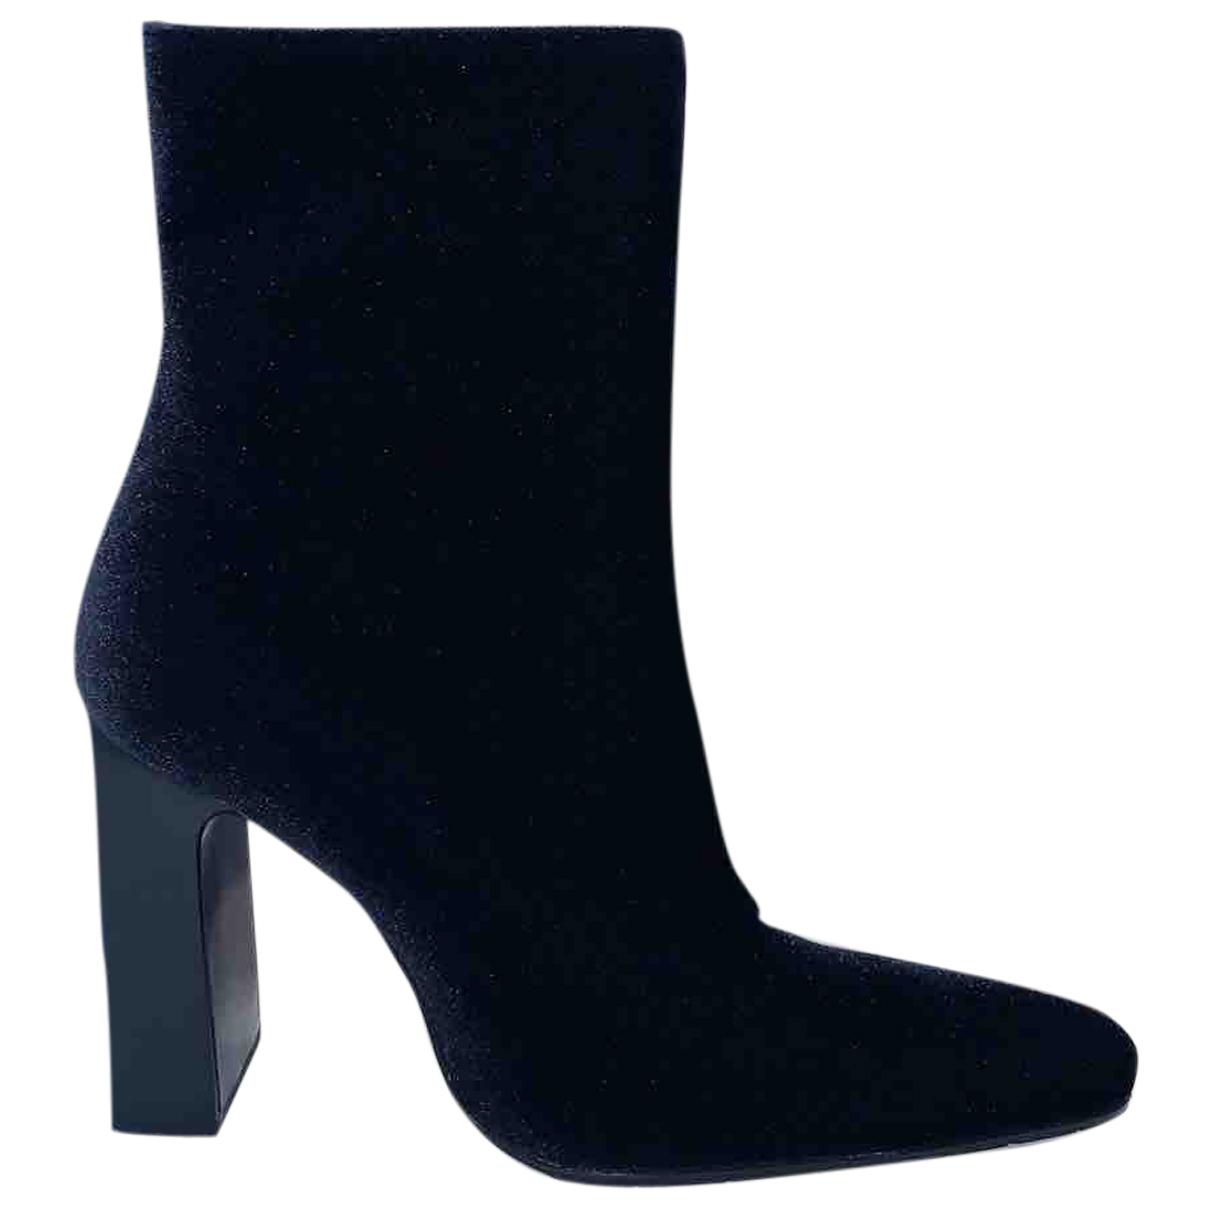 Balenciaga - Boots   pour femme en velours - noir